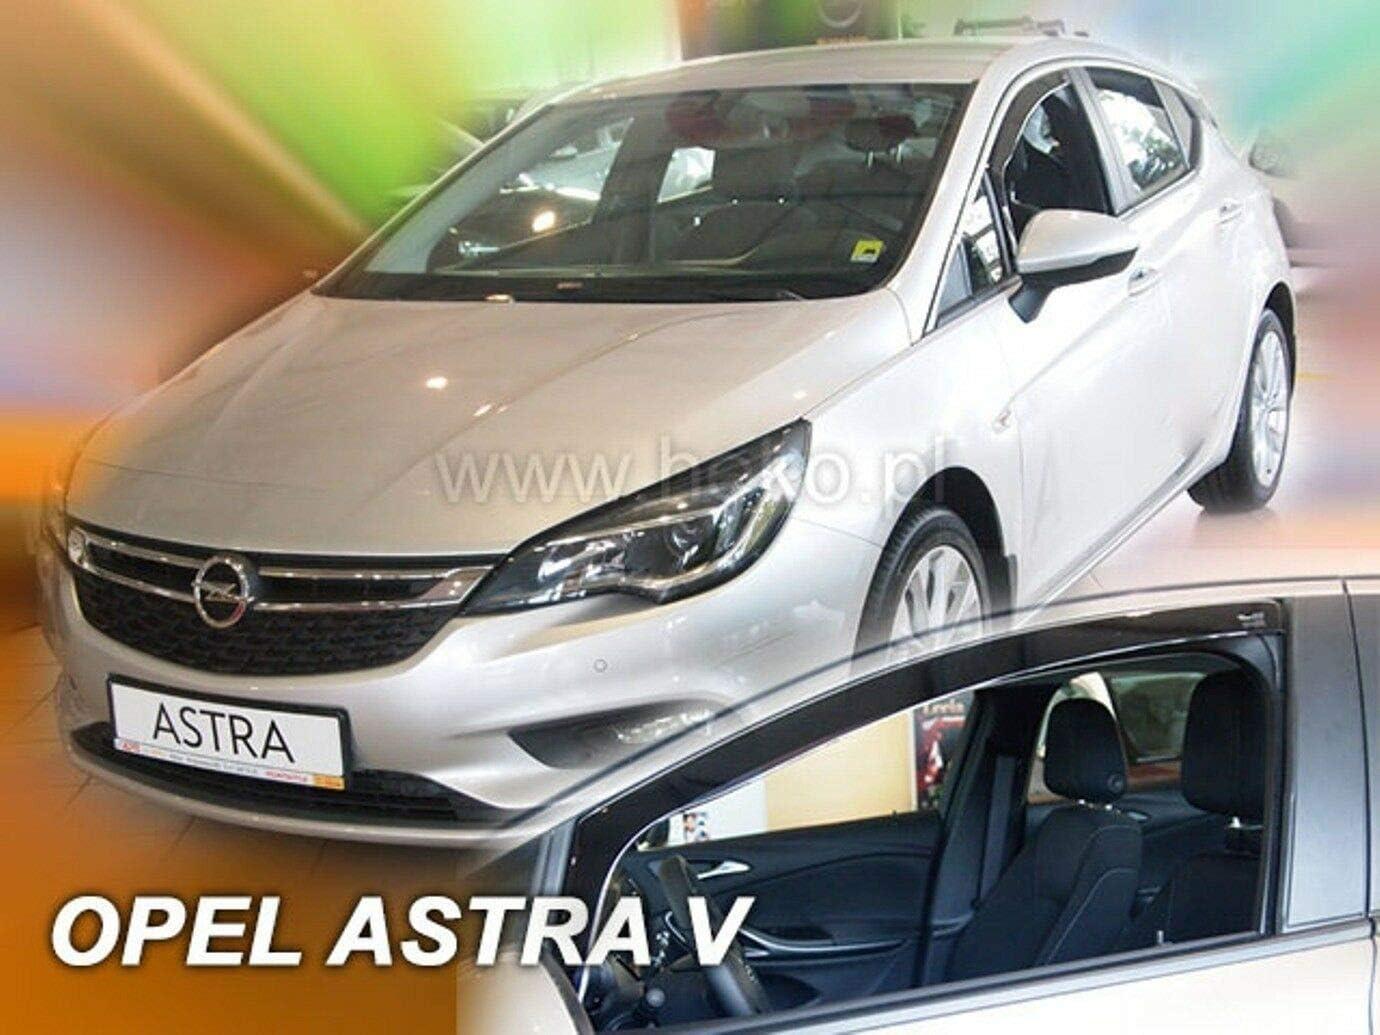 Deflectores de Viento para Opel Astra V K 5 Puertas 2015-pr/és 2 Piezas J/&J AUTOMOTIVE J/&J